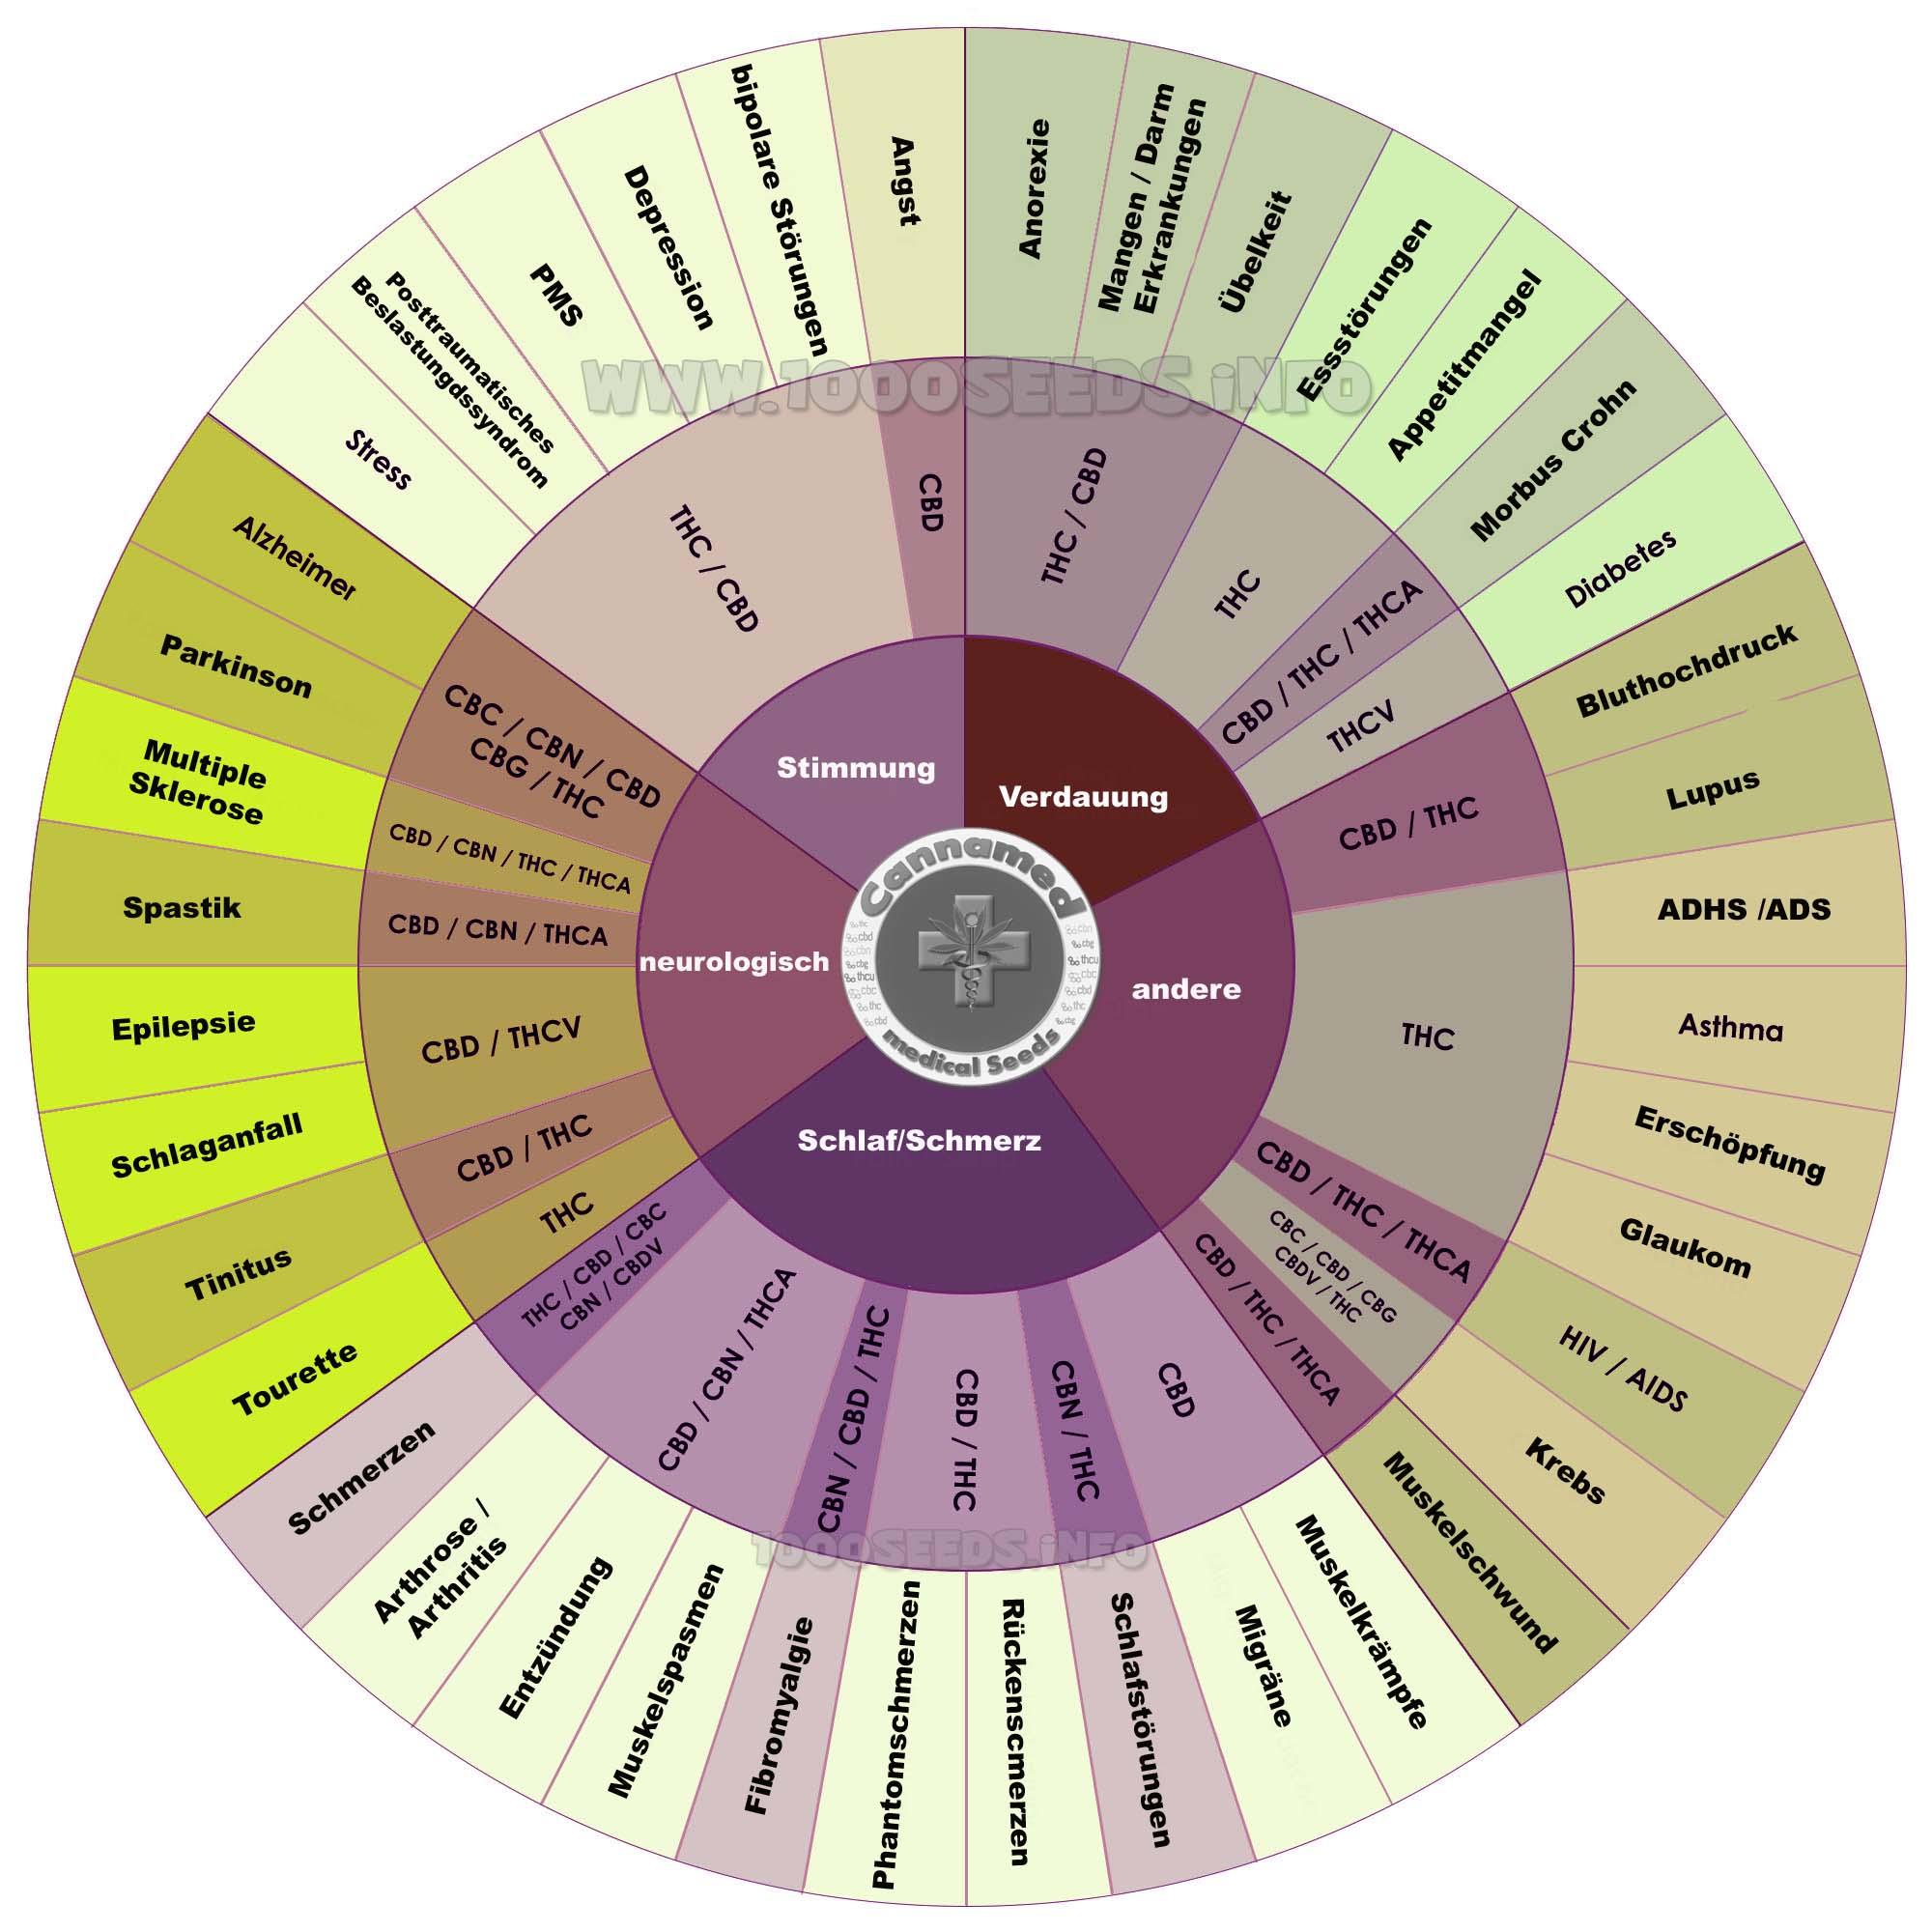 Cannabinoide bei verschiedenen Erkrankungen